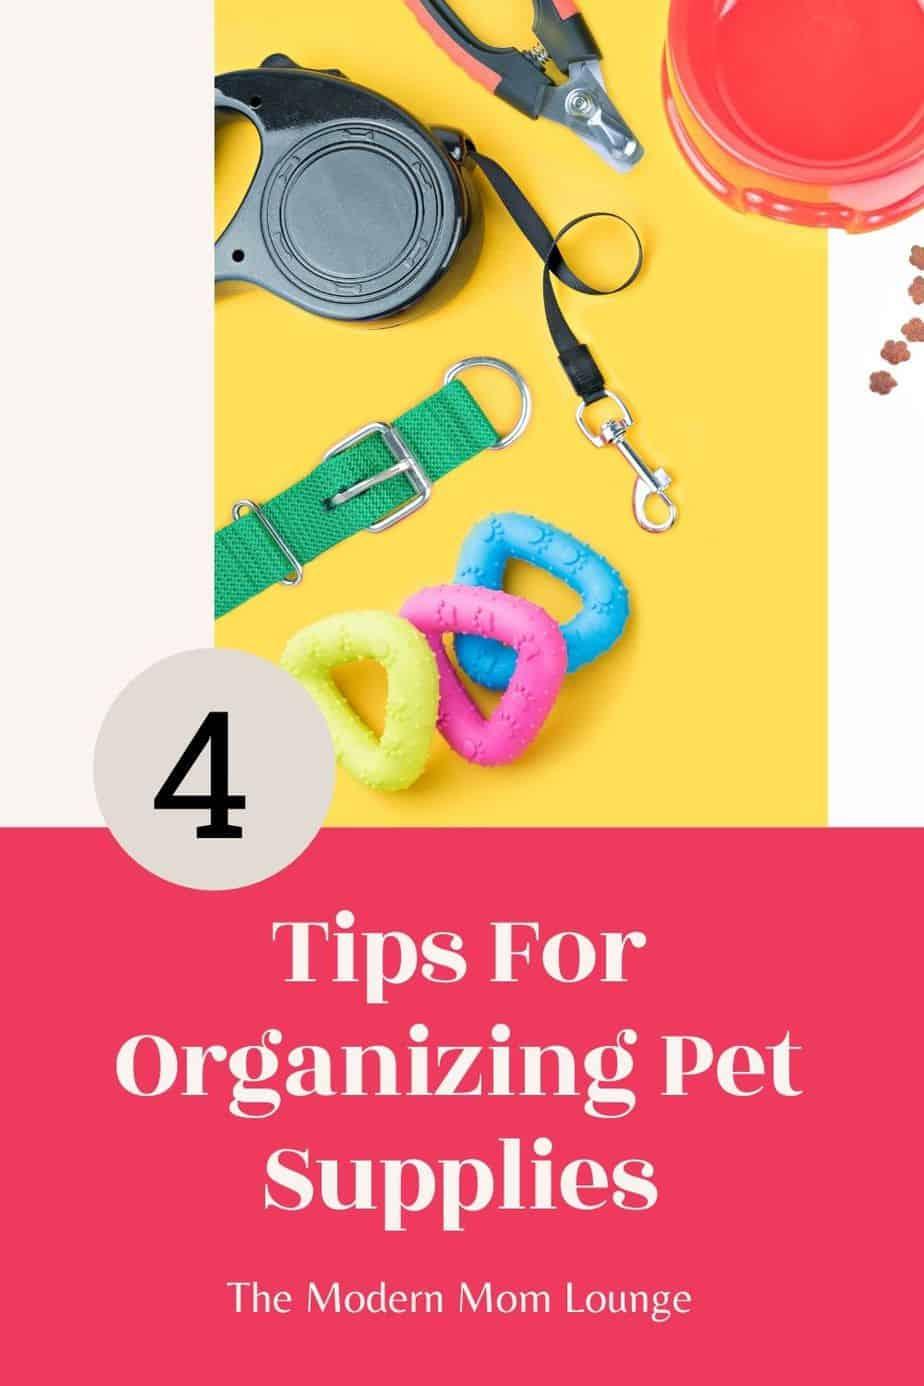 4 Tips to Organizing Pet Supplies